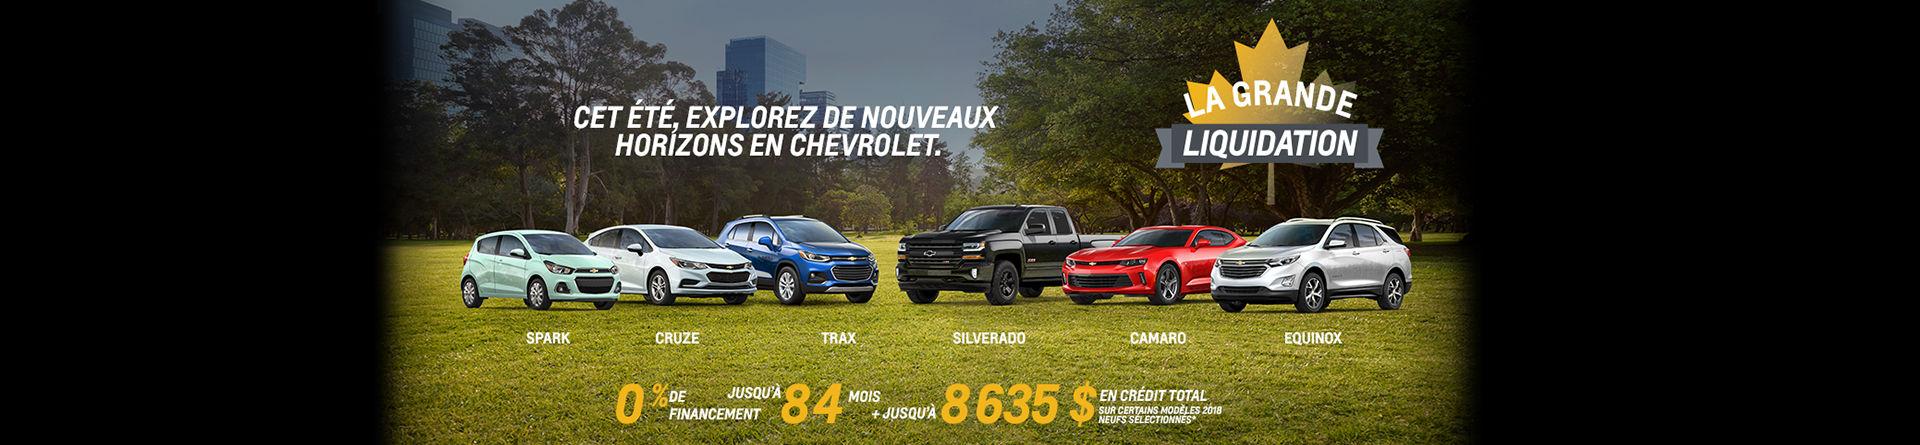 Chevrolet Aout Slider